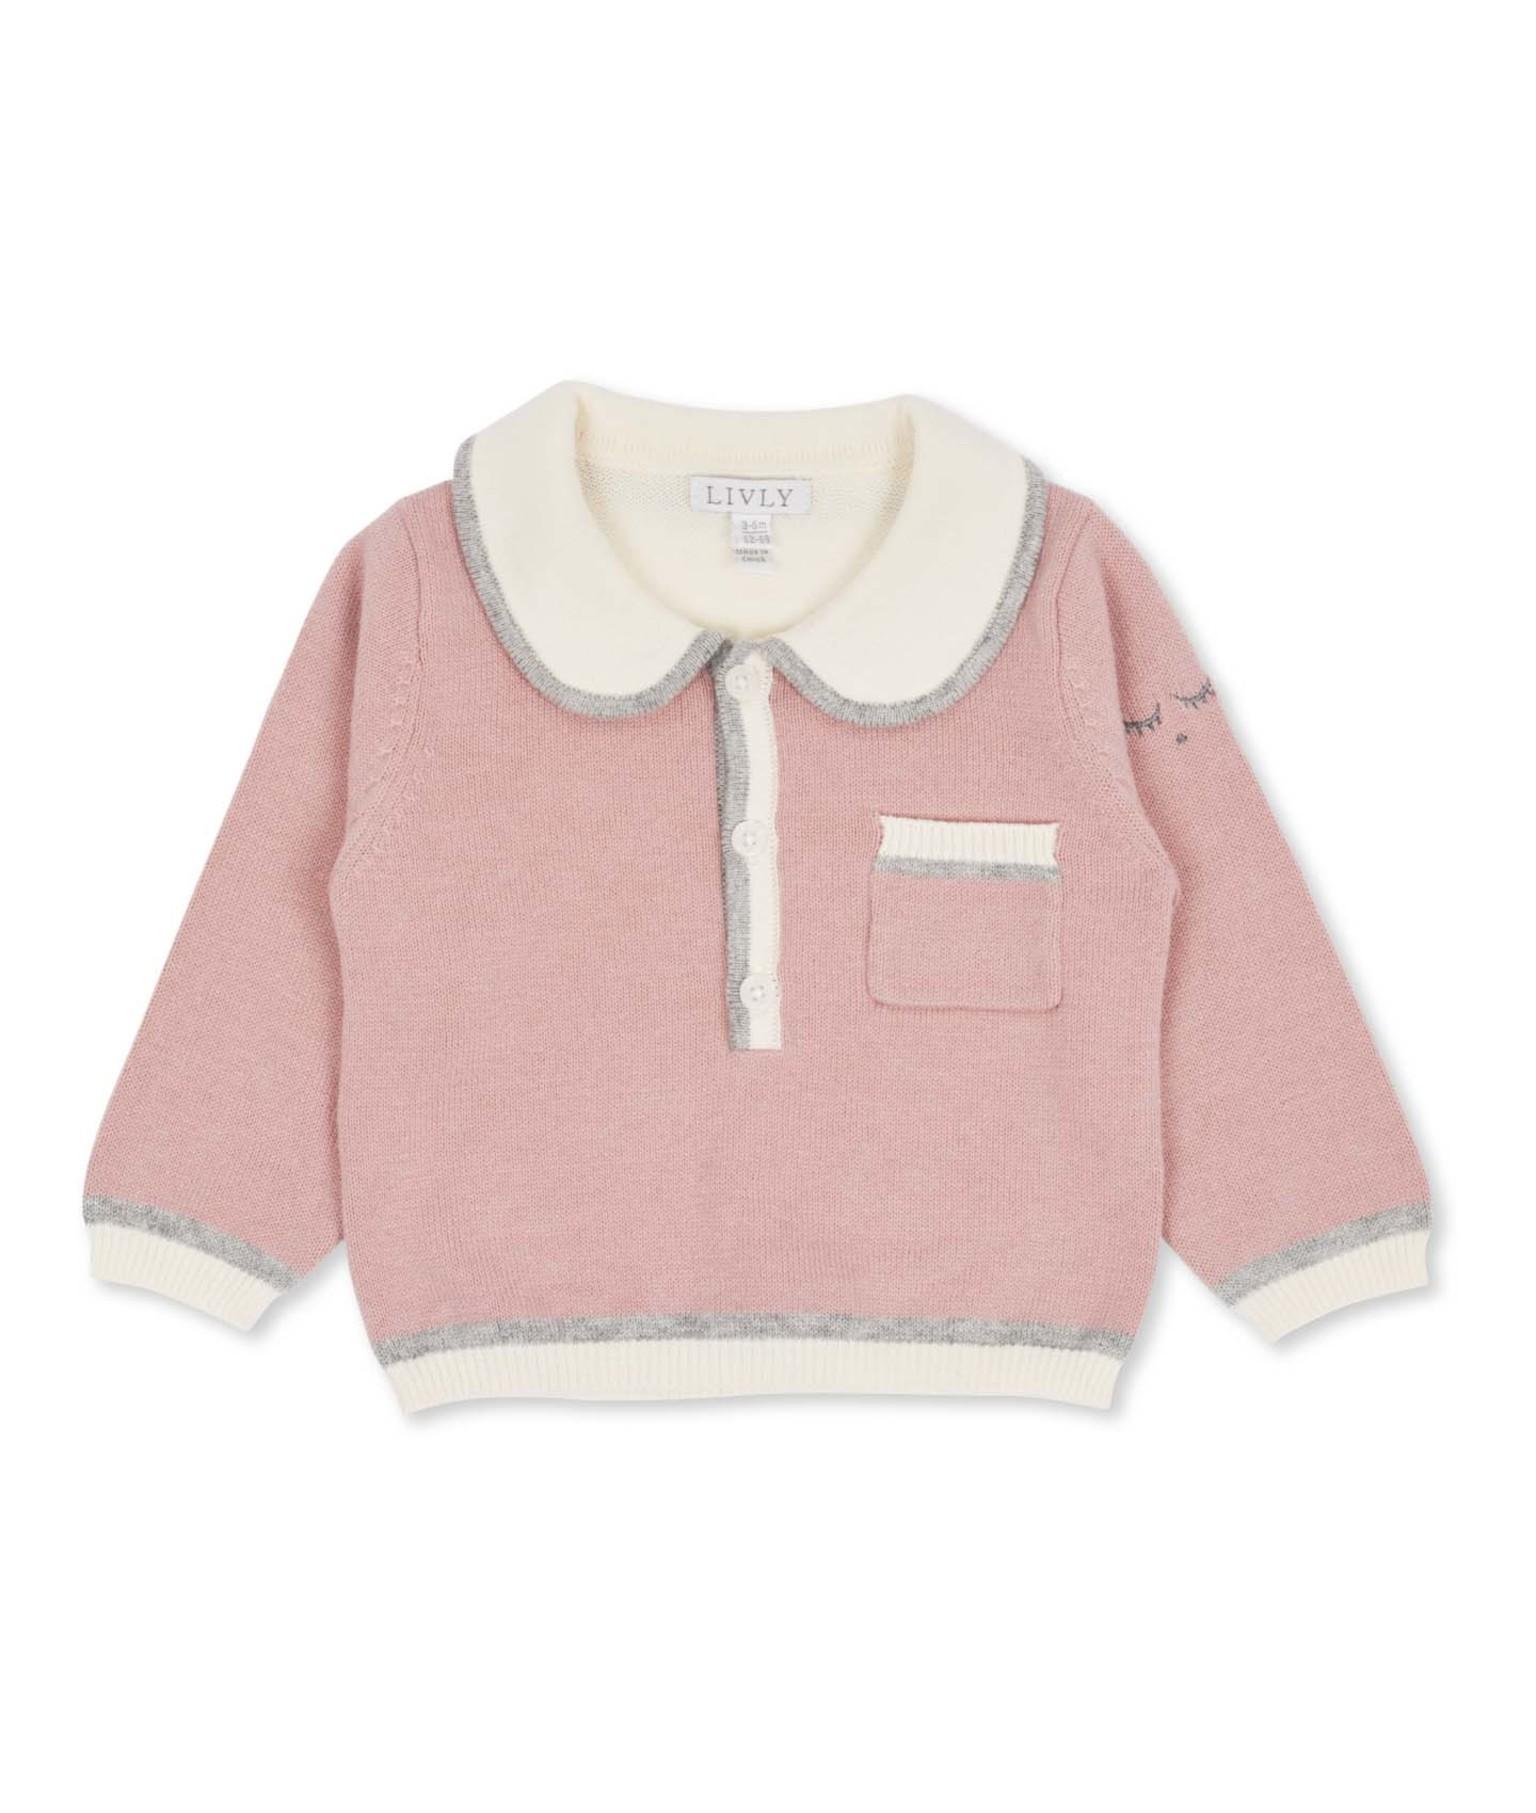 Livly Scallop Collar sweater